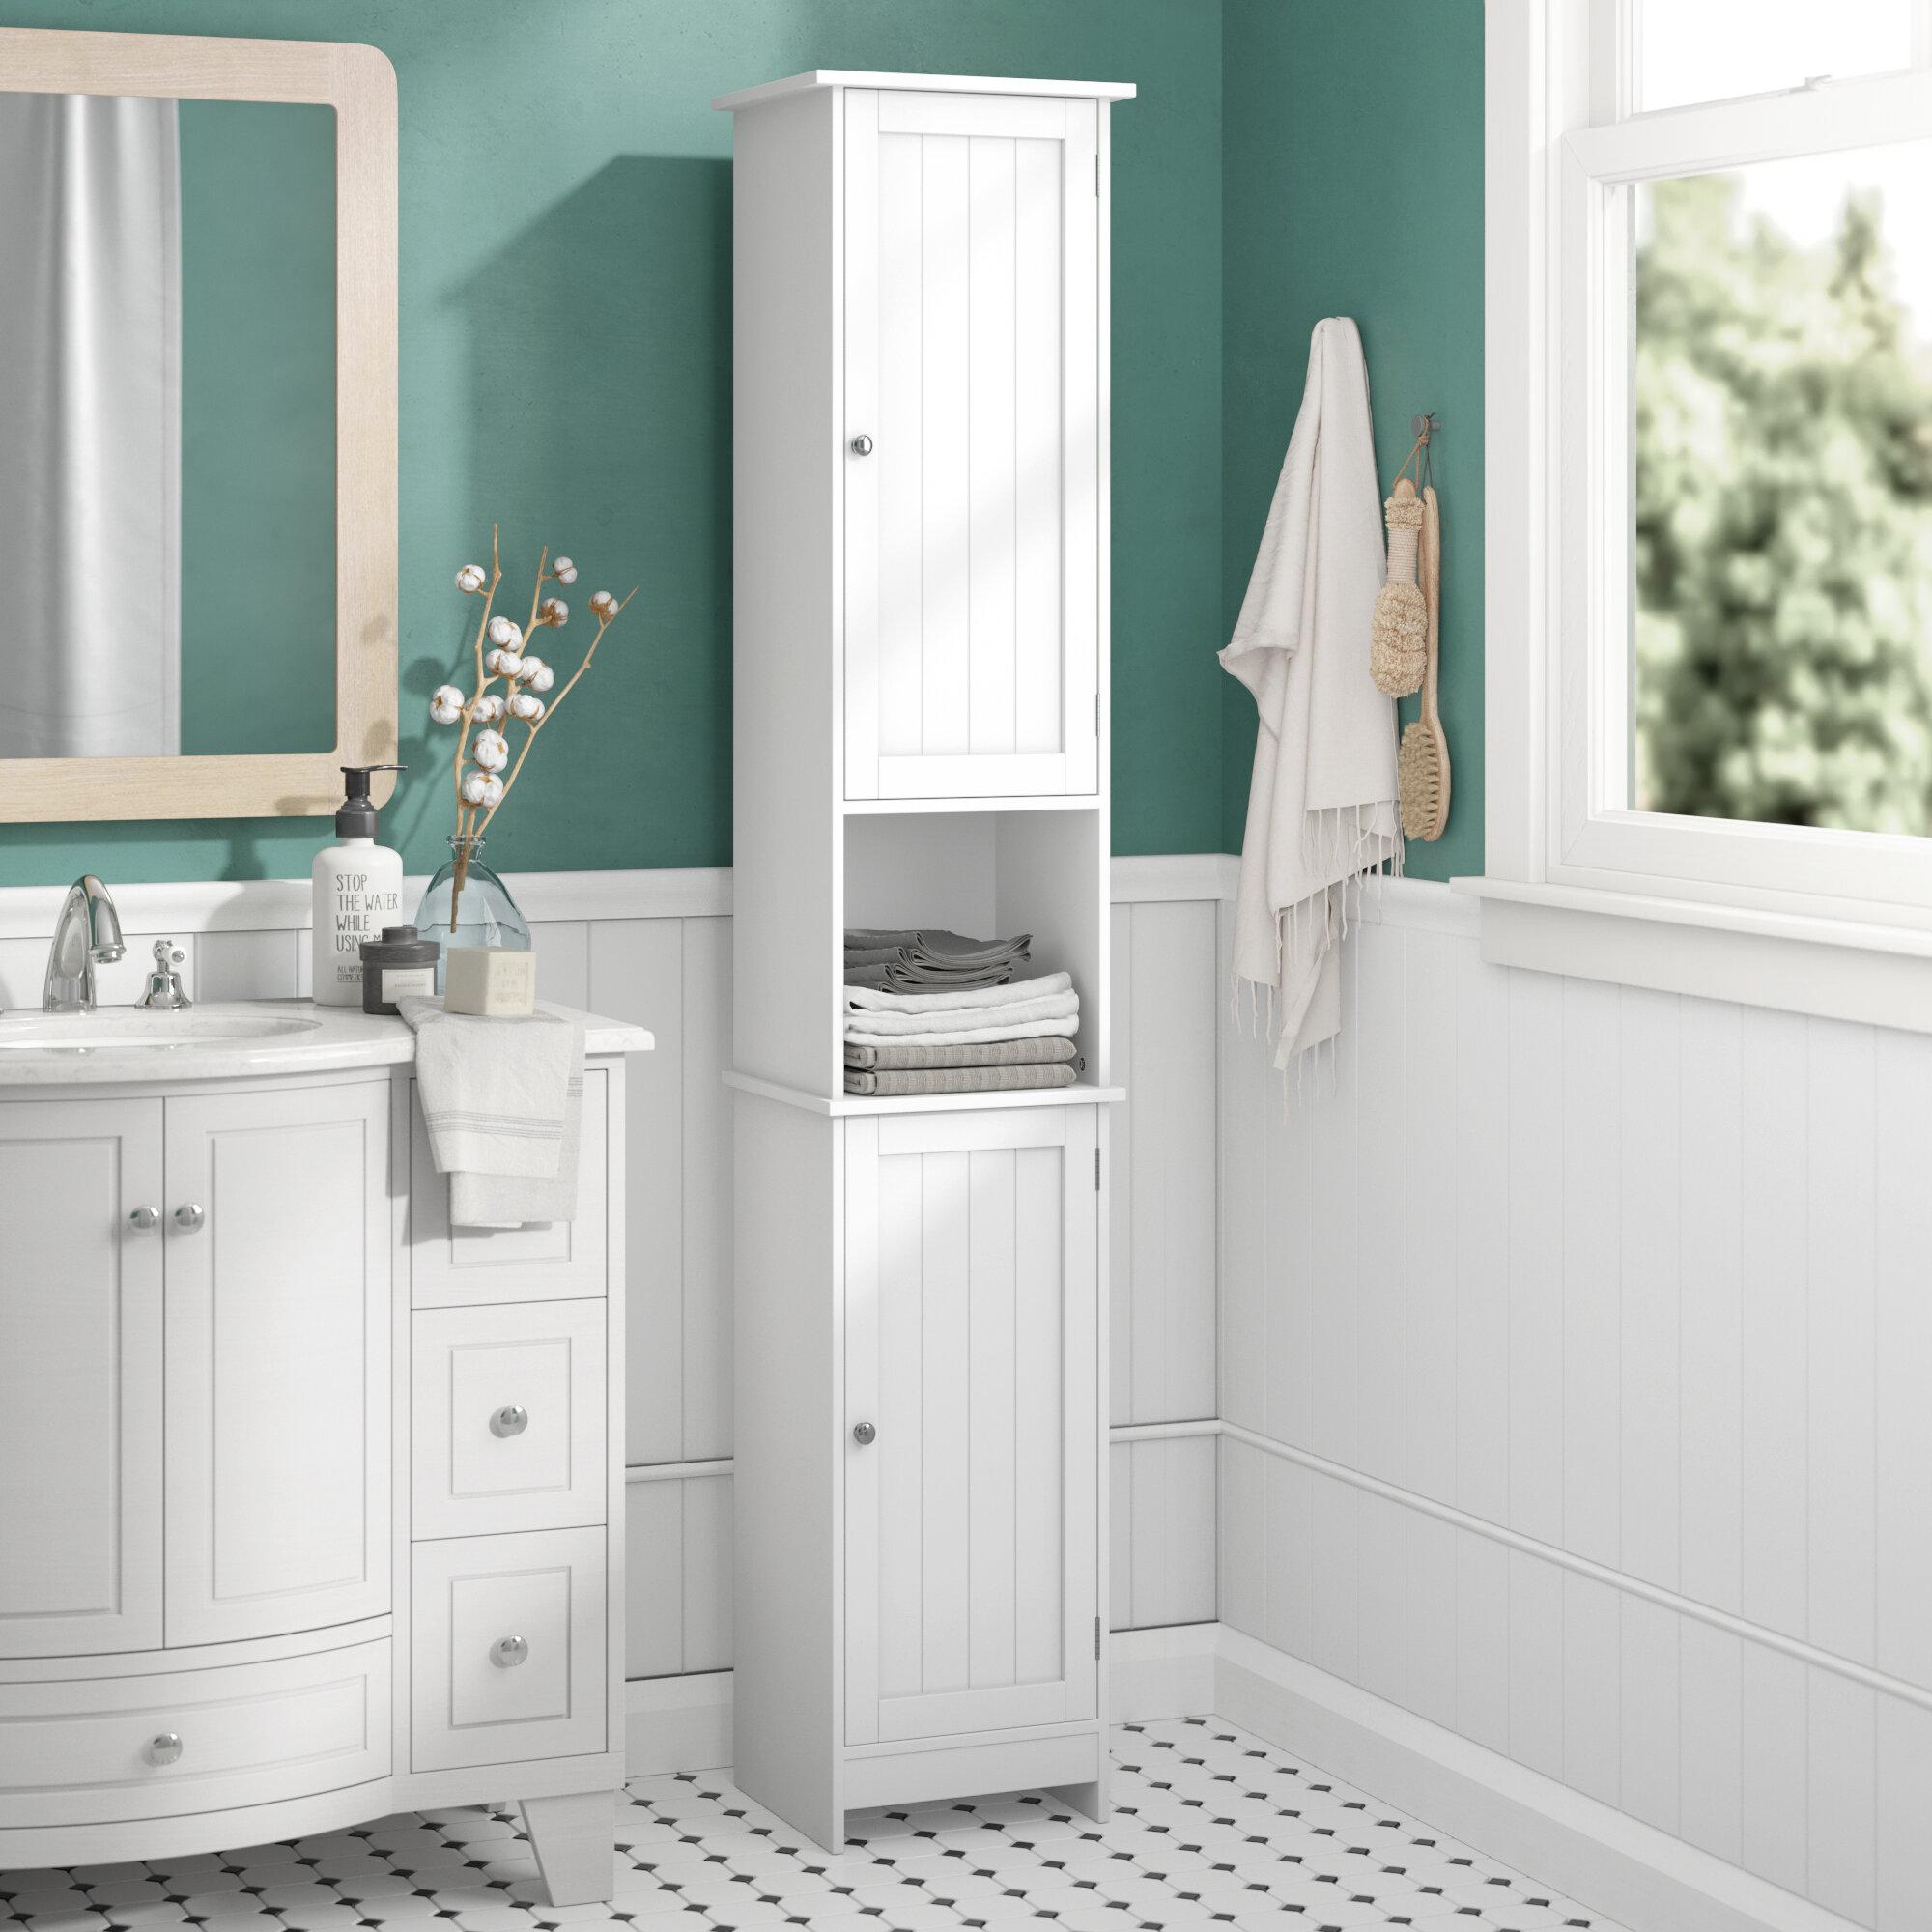 Wildon Home Vida Priano 32 x 170cm Free Standing Tall Bathroom Cabinet & Reviews | Wayfair.co.uk